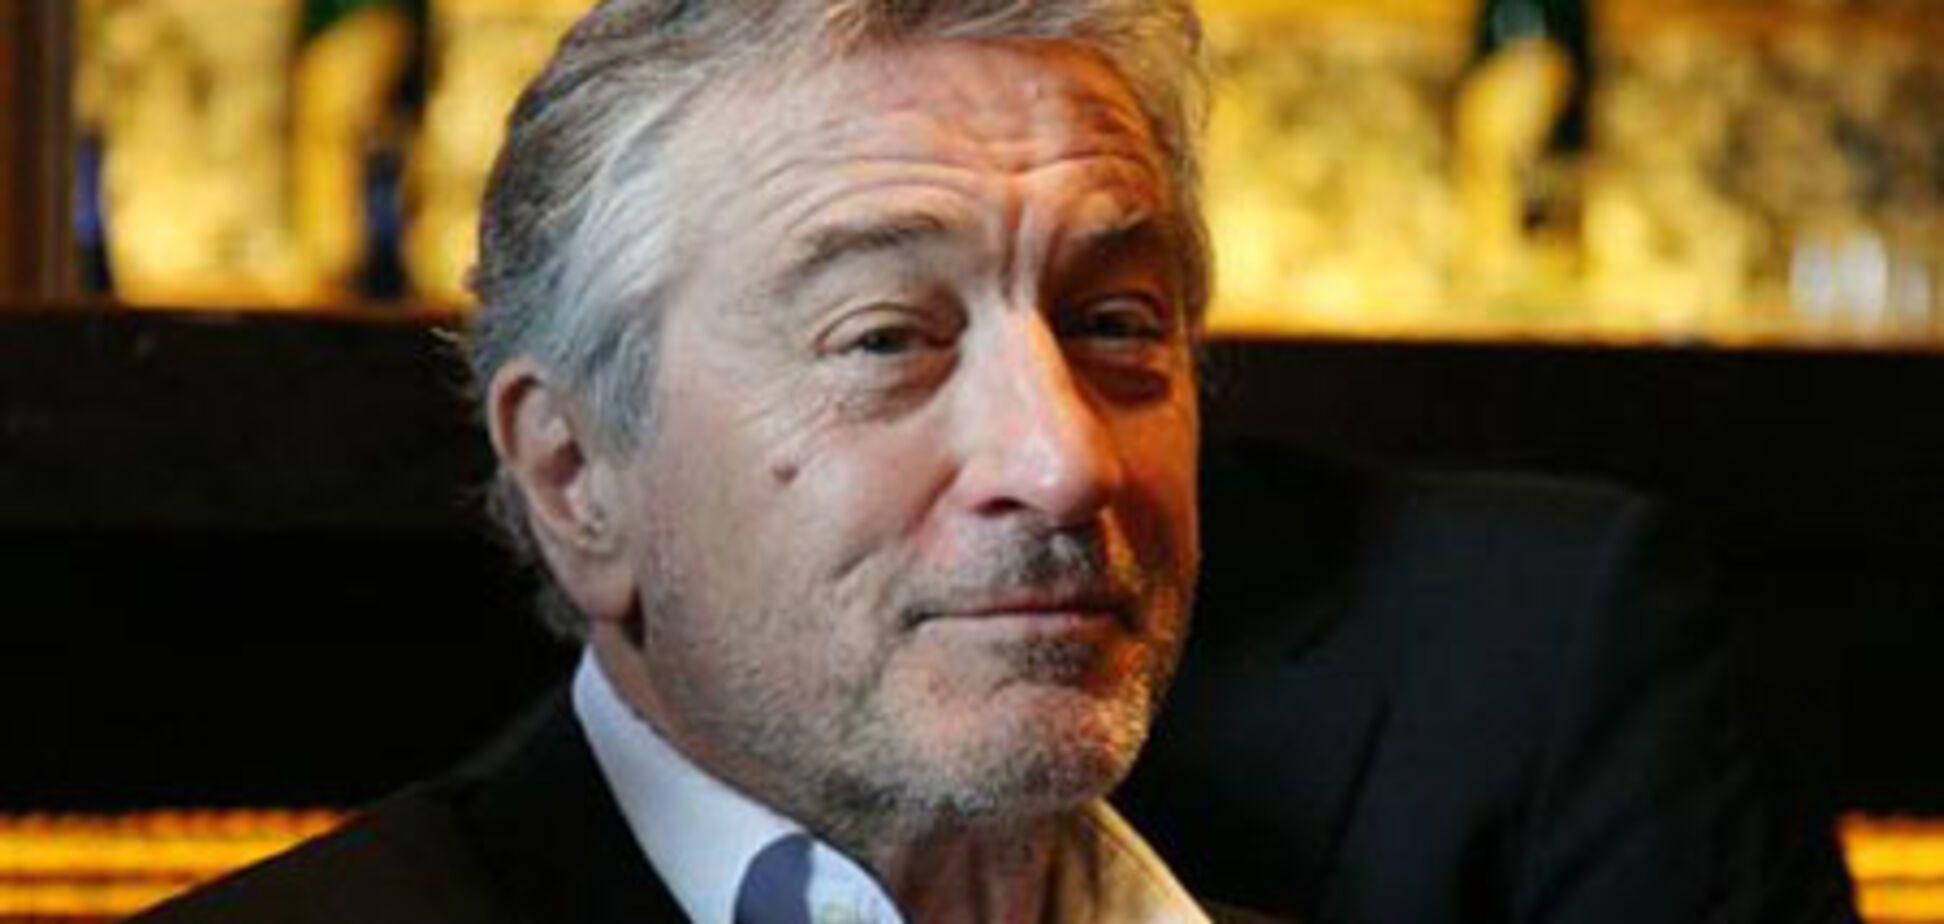 Актер Роберт де Ниро откроет ресторан в Будапеште